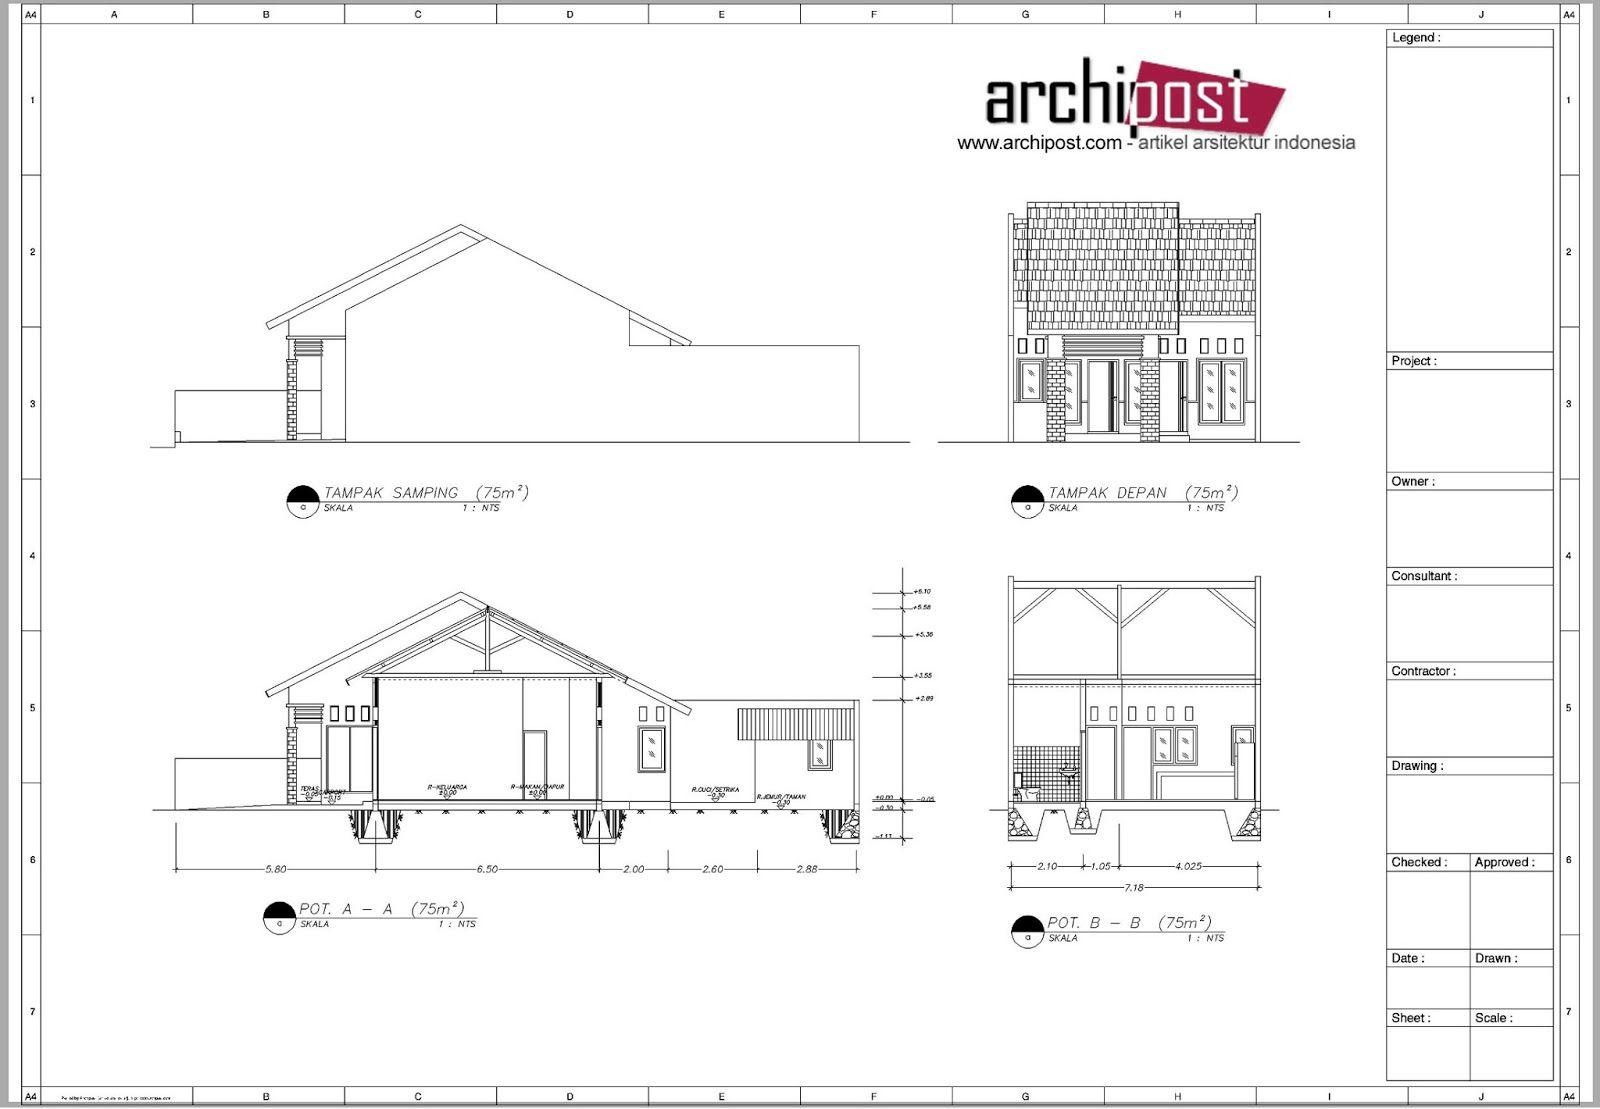 Rancangan Contoh Gambar Denah Dan Potongan Rumah Yang Modern Rumahminimalispro Com Rumah Denah Lantai Rumah Denah Rumah